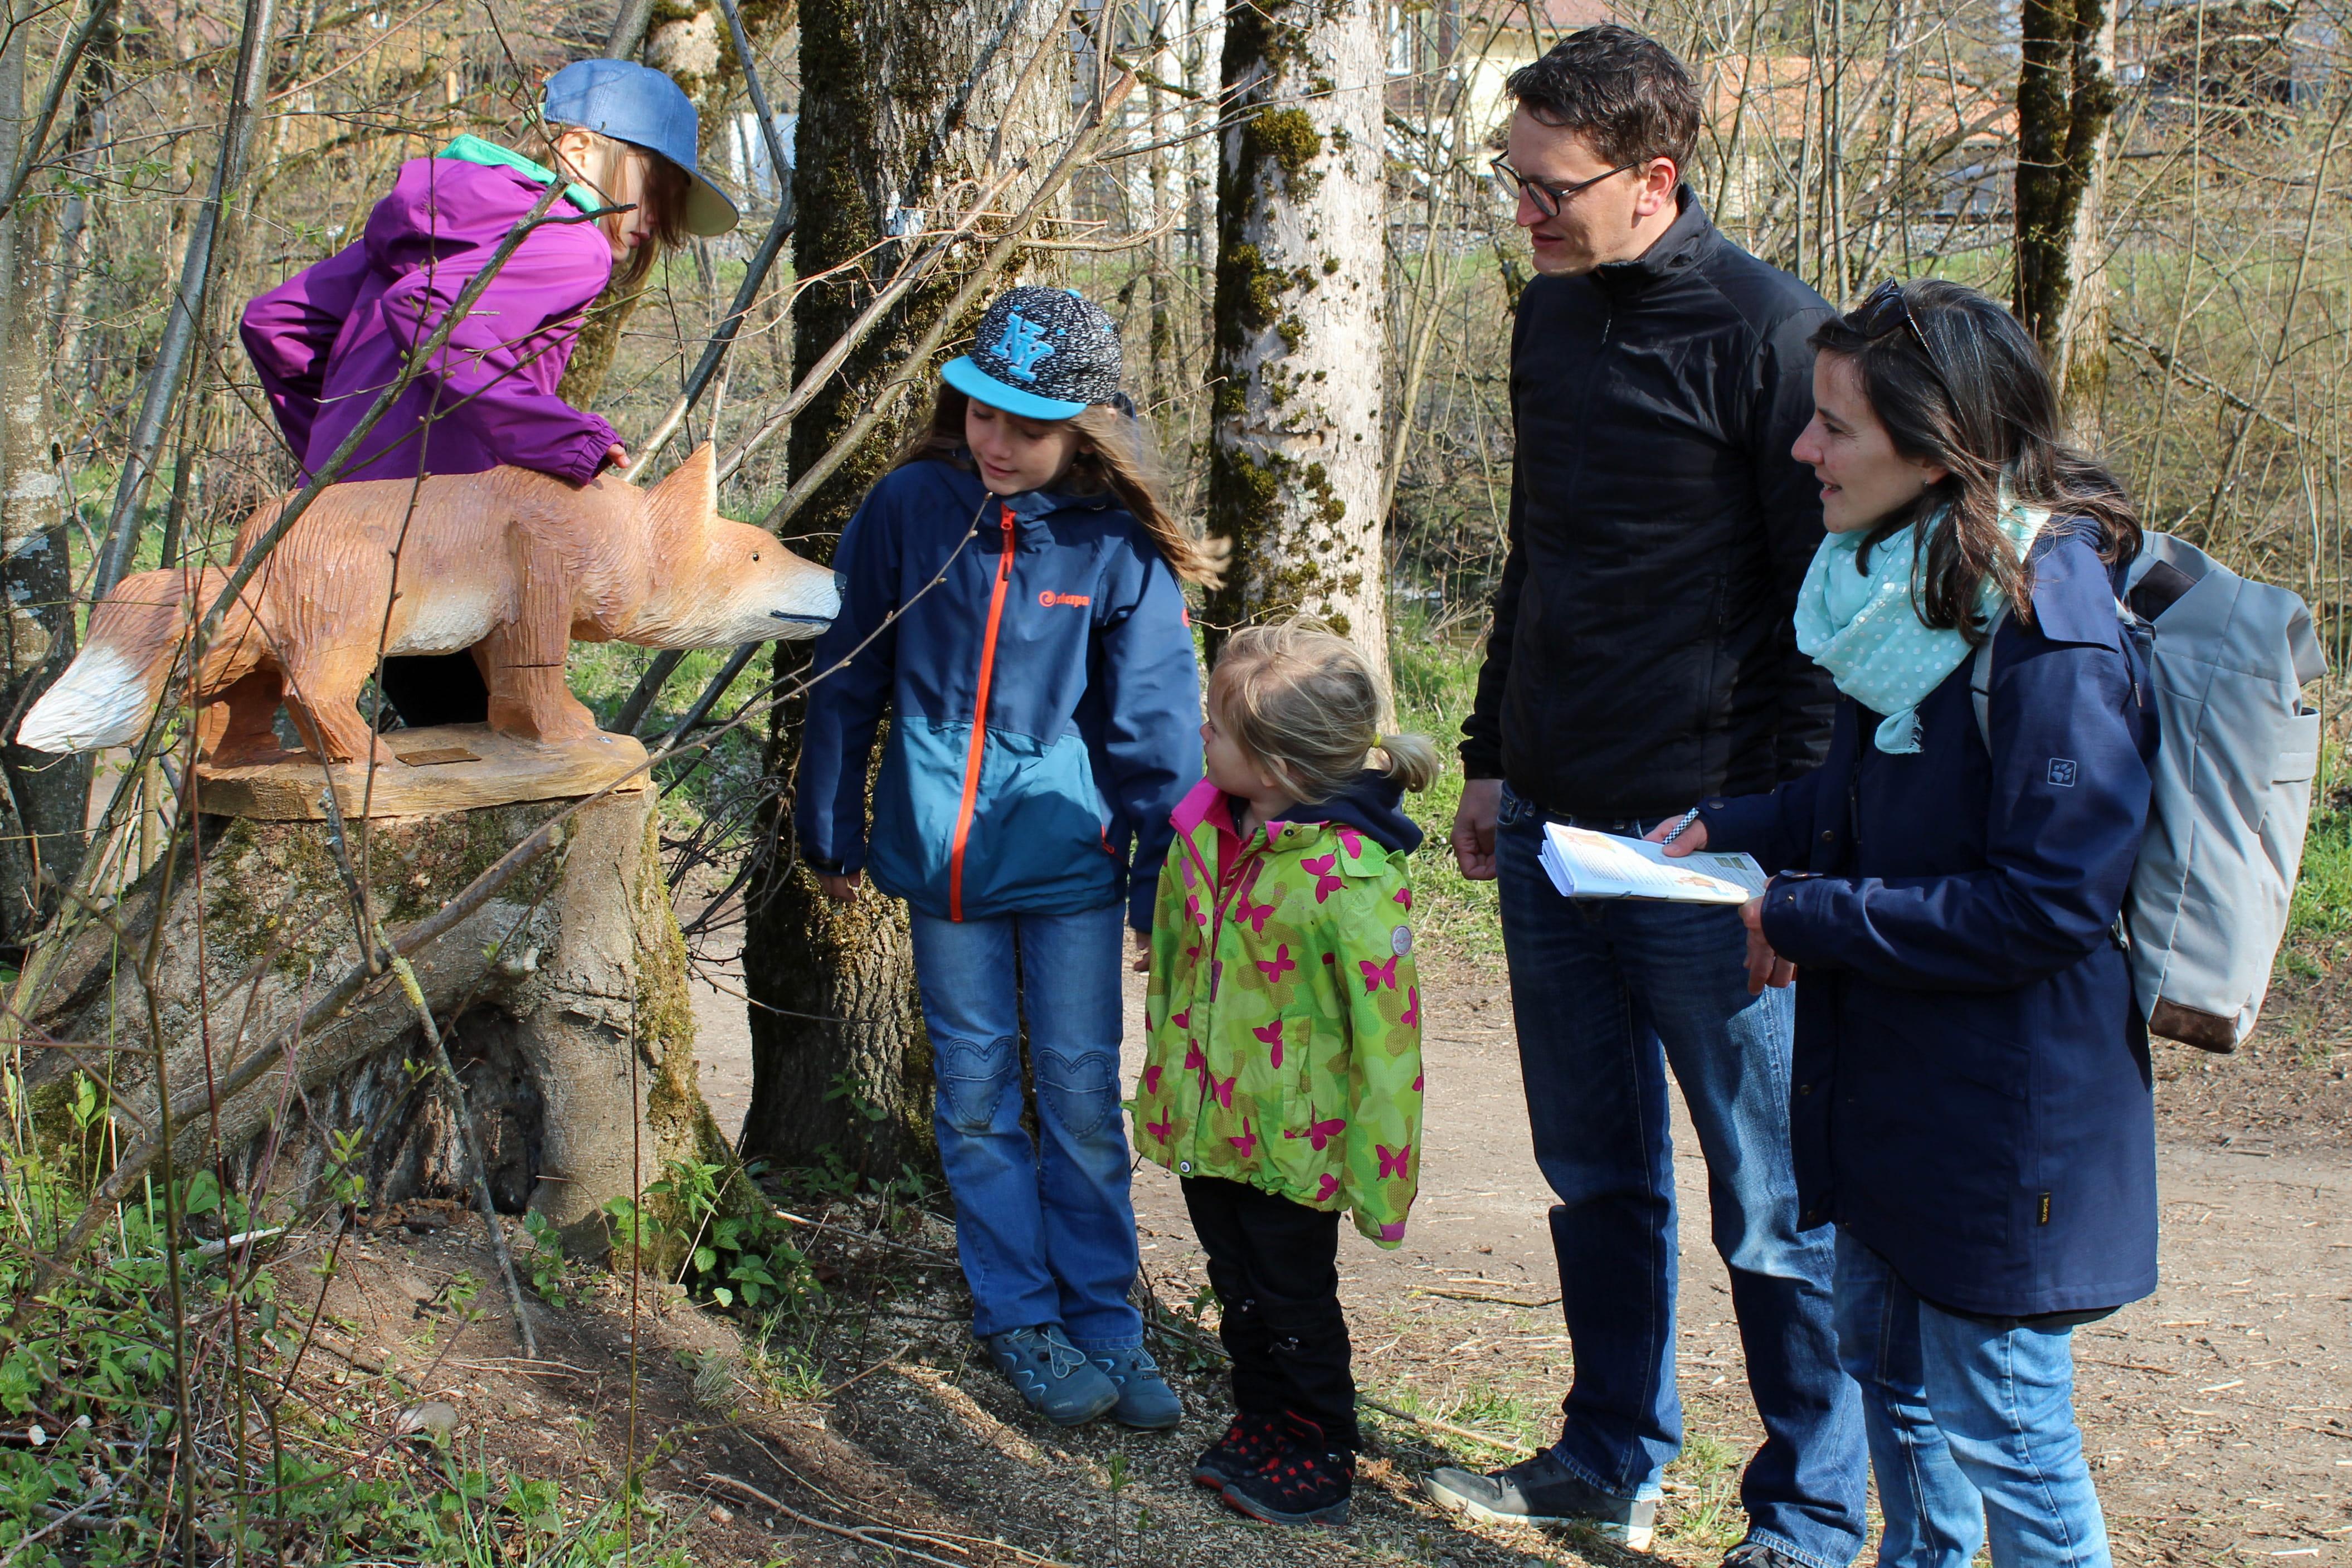 Kambly Schnitzeljagd Familie mit Fuchs